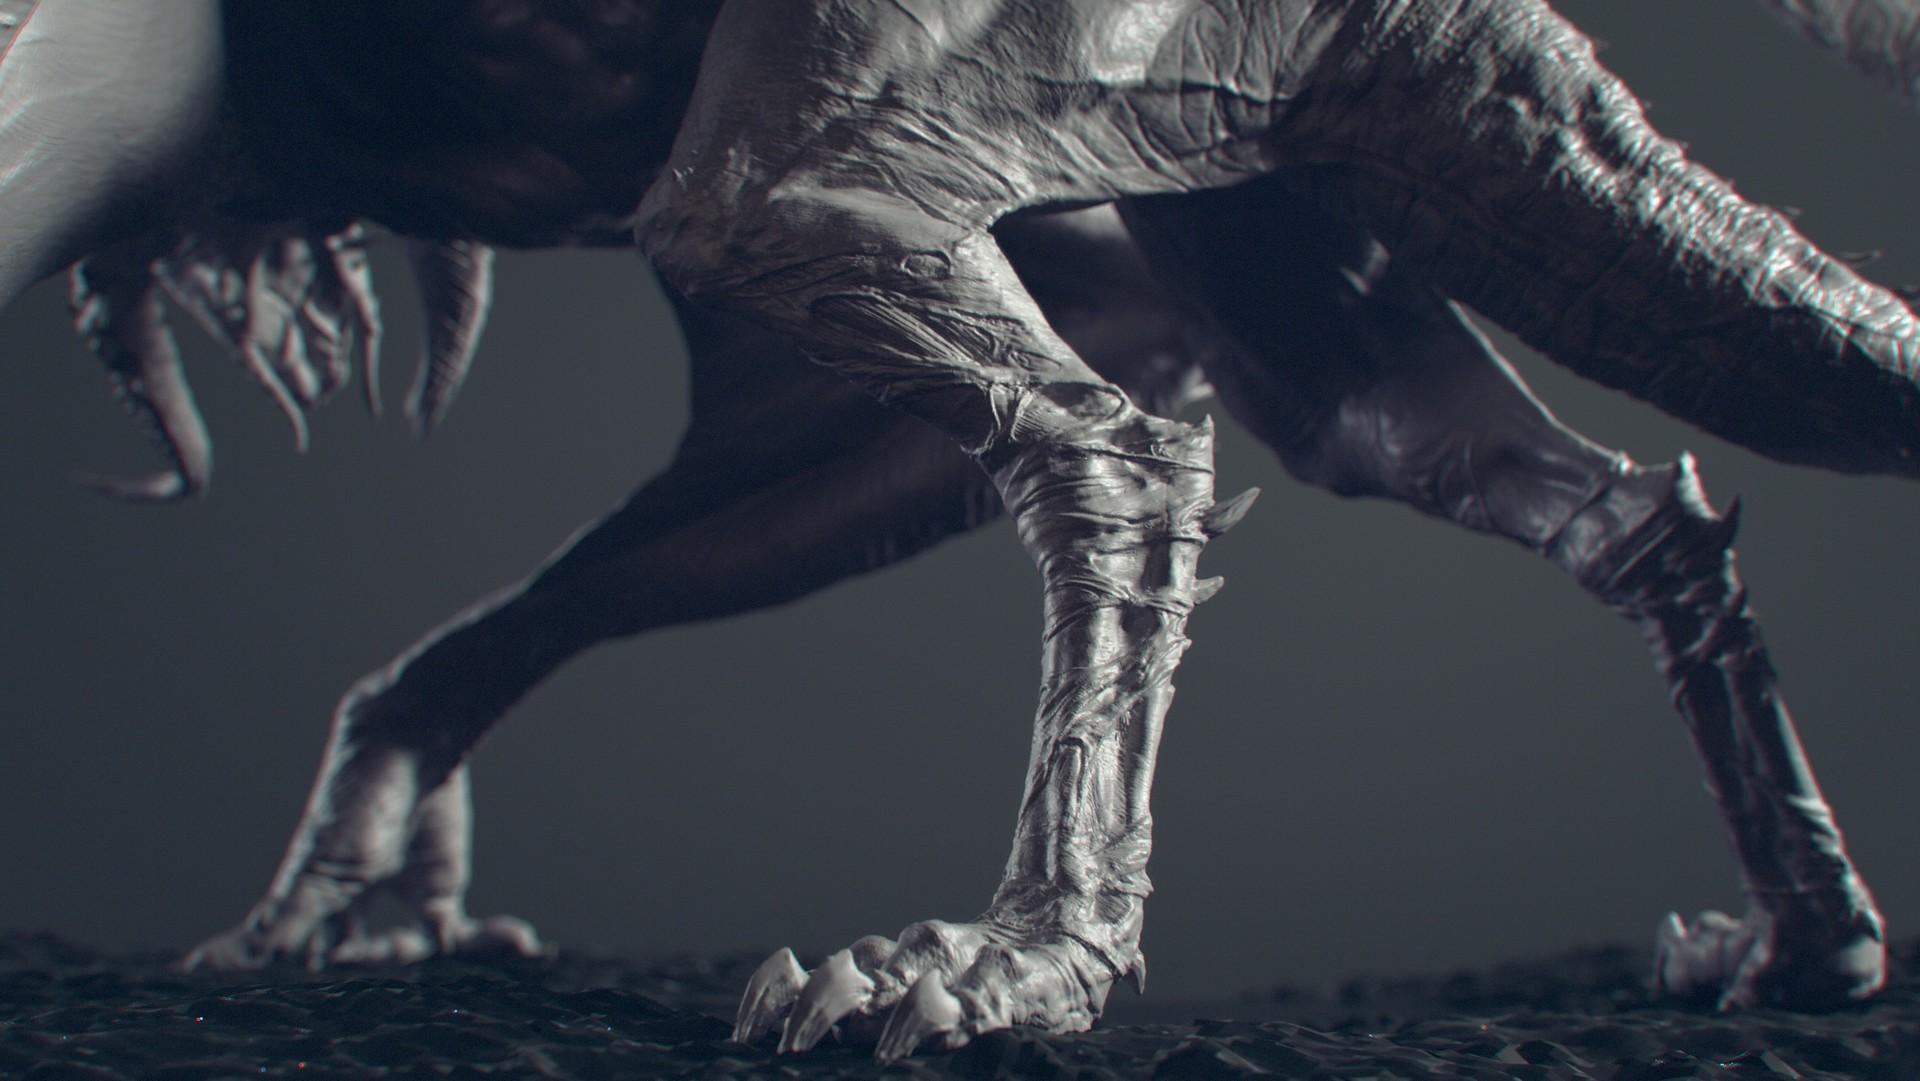 Abner marin tdt crimsoncreature foot am 02